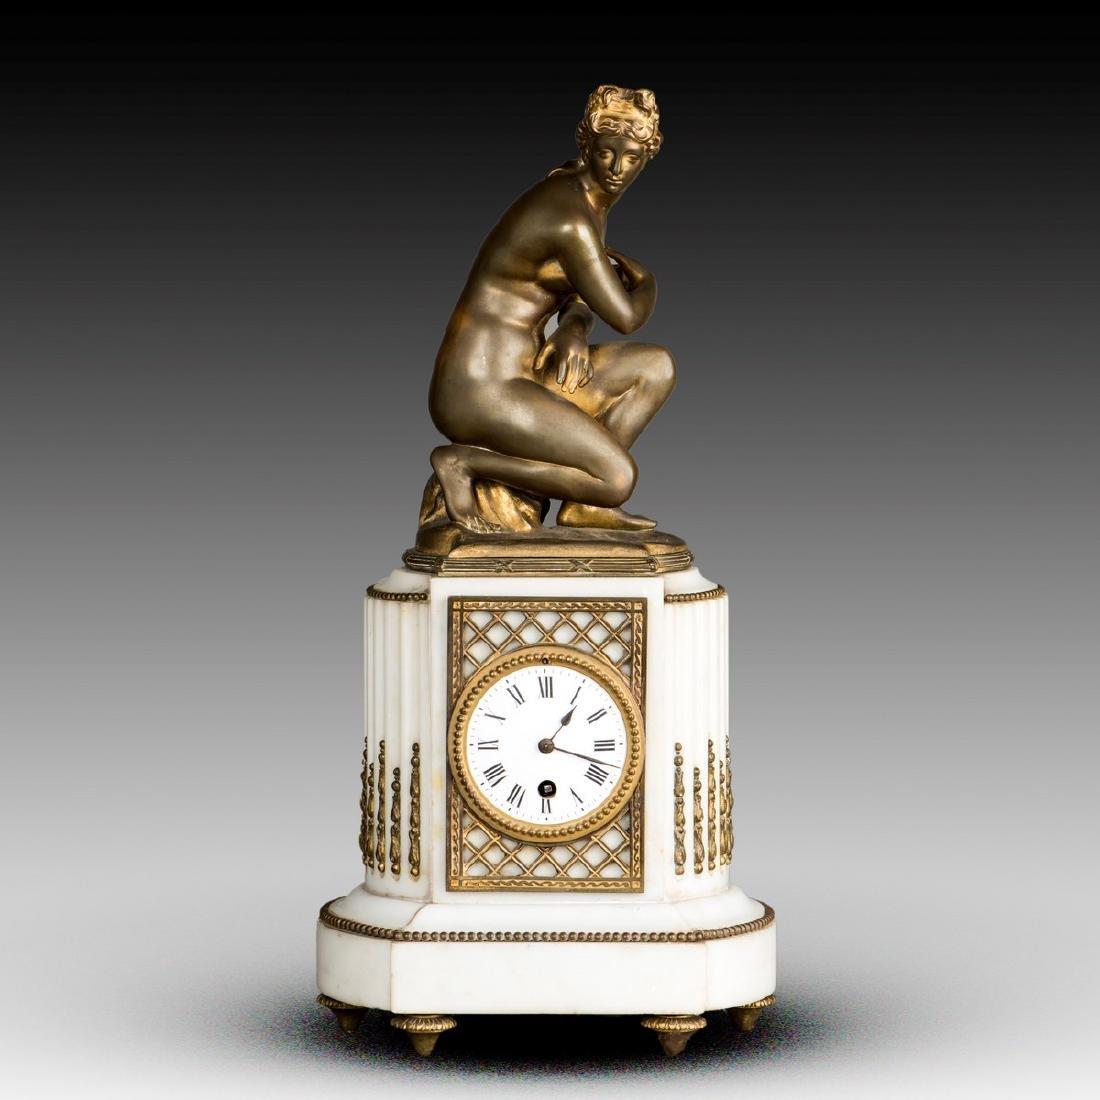 A FRENCH BRONZE MANTEL CLOCK, 19TH CENTURY